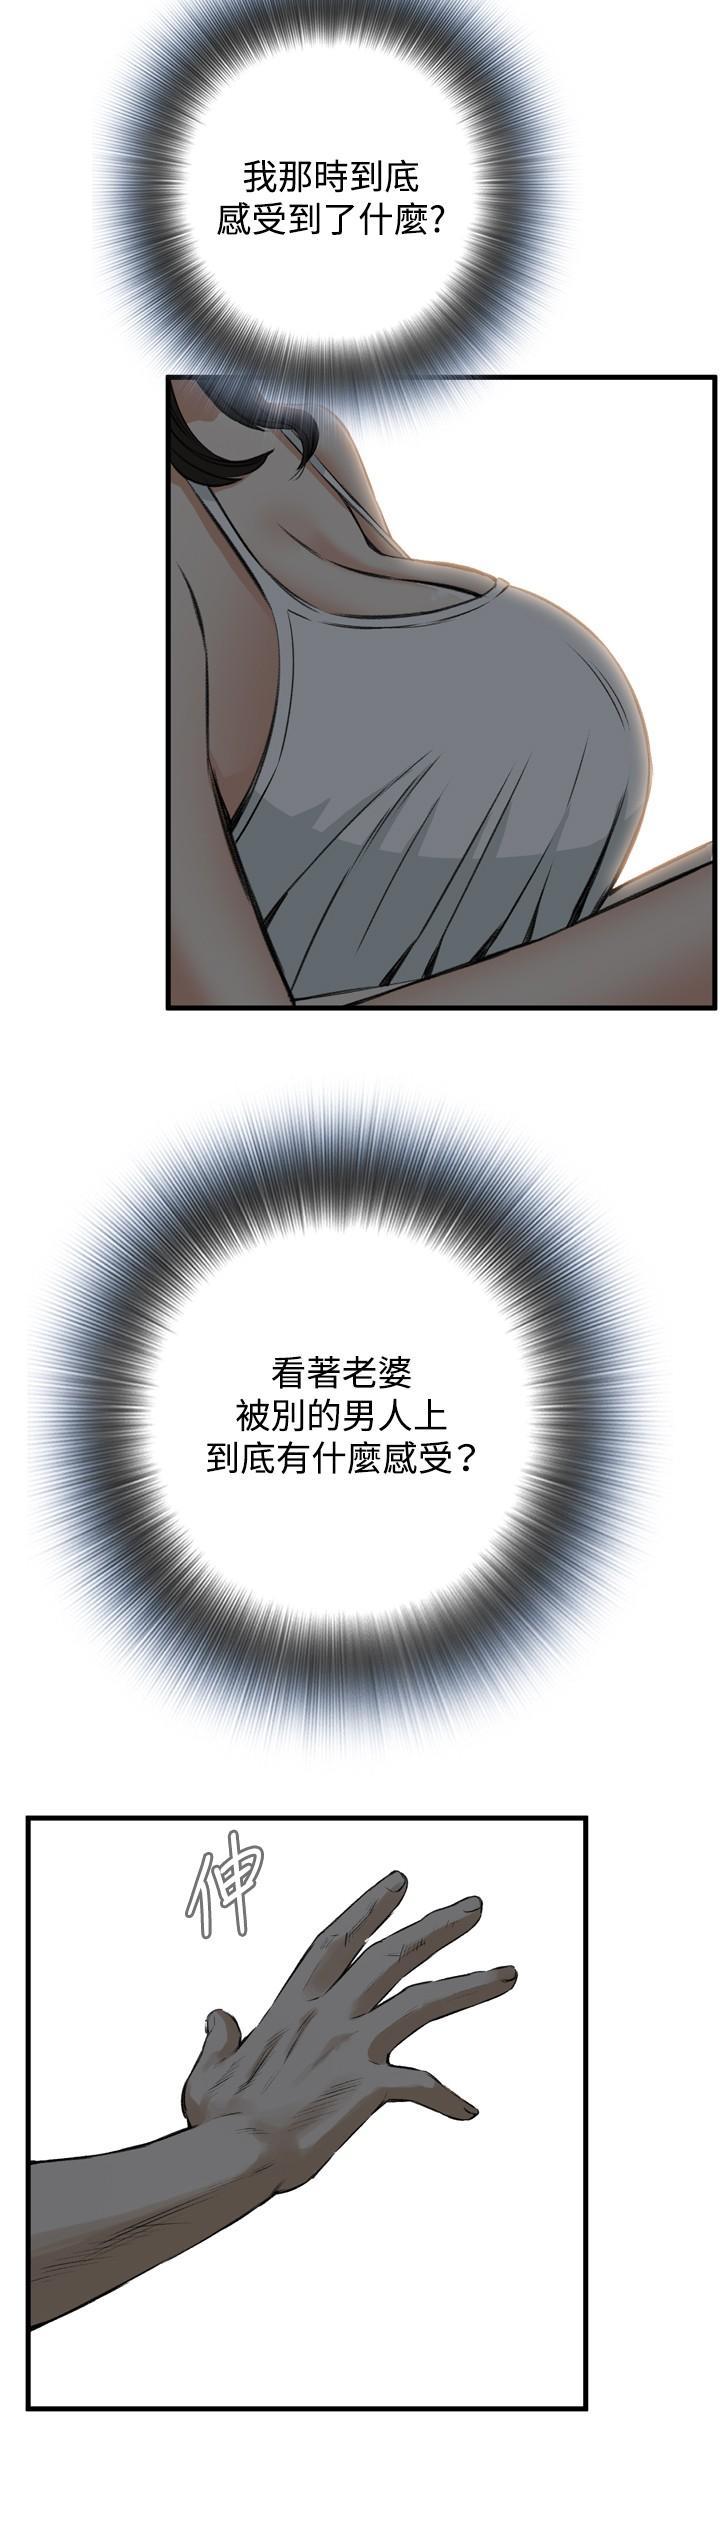 Take a Peek 偷窥 Ch.39~60 [Chinese]中文 192